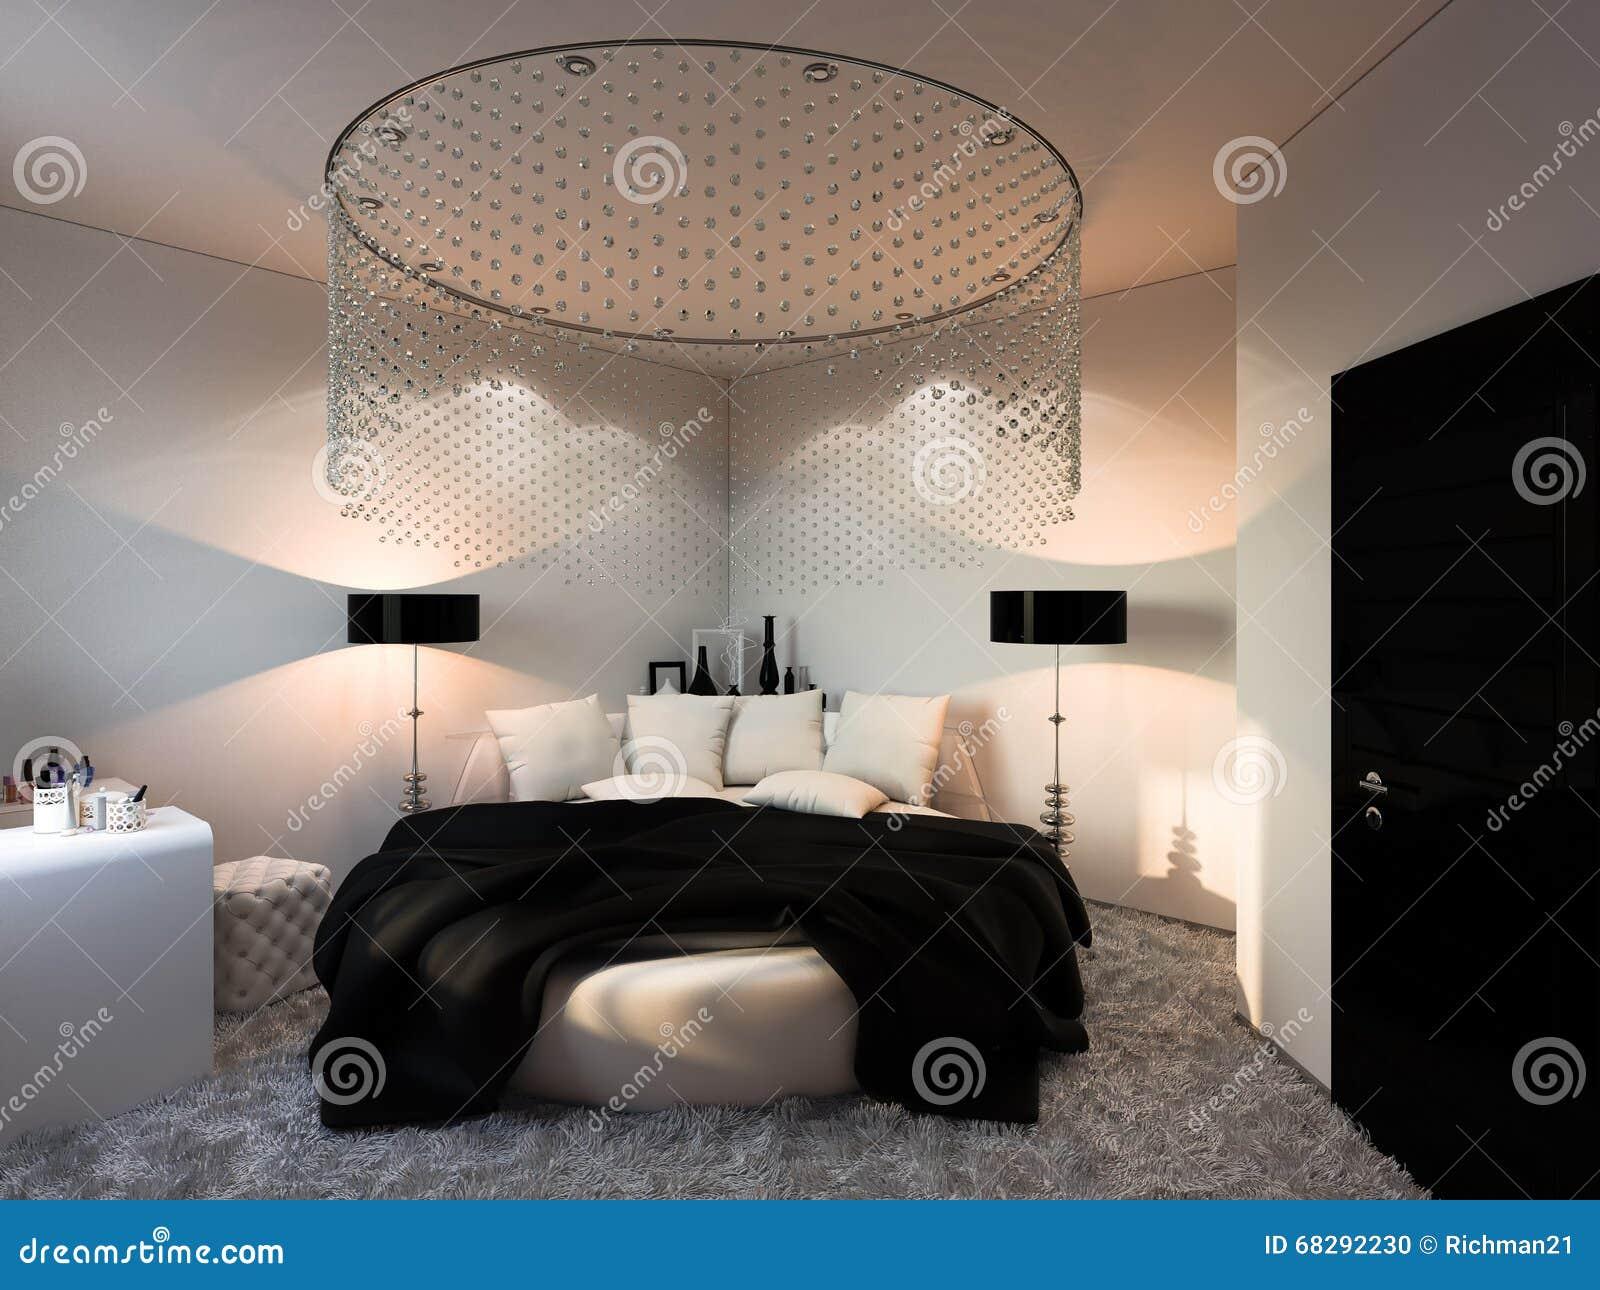 Interior Design Bedroom In Black And White Colors Stock